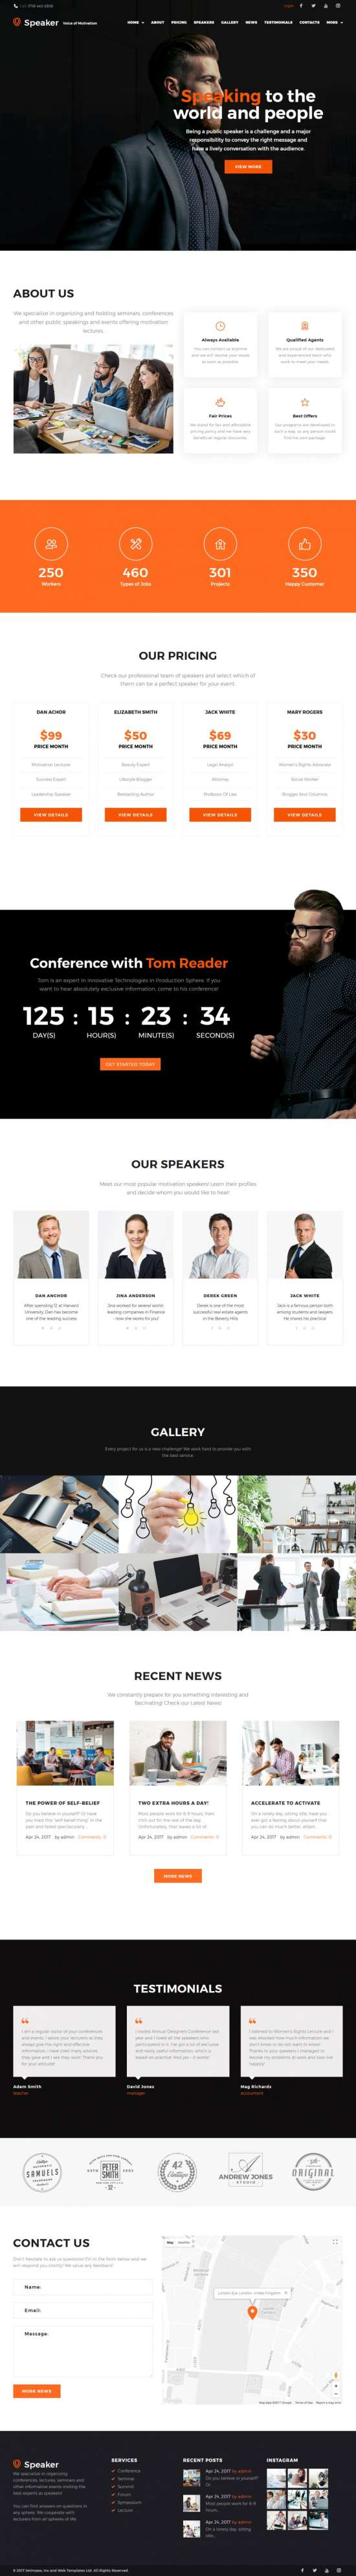 speaker wordpress theme 550x3982 - Speaker WordPress Theme